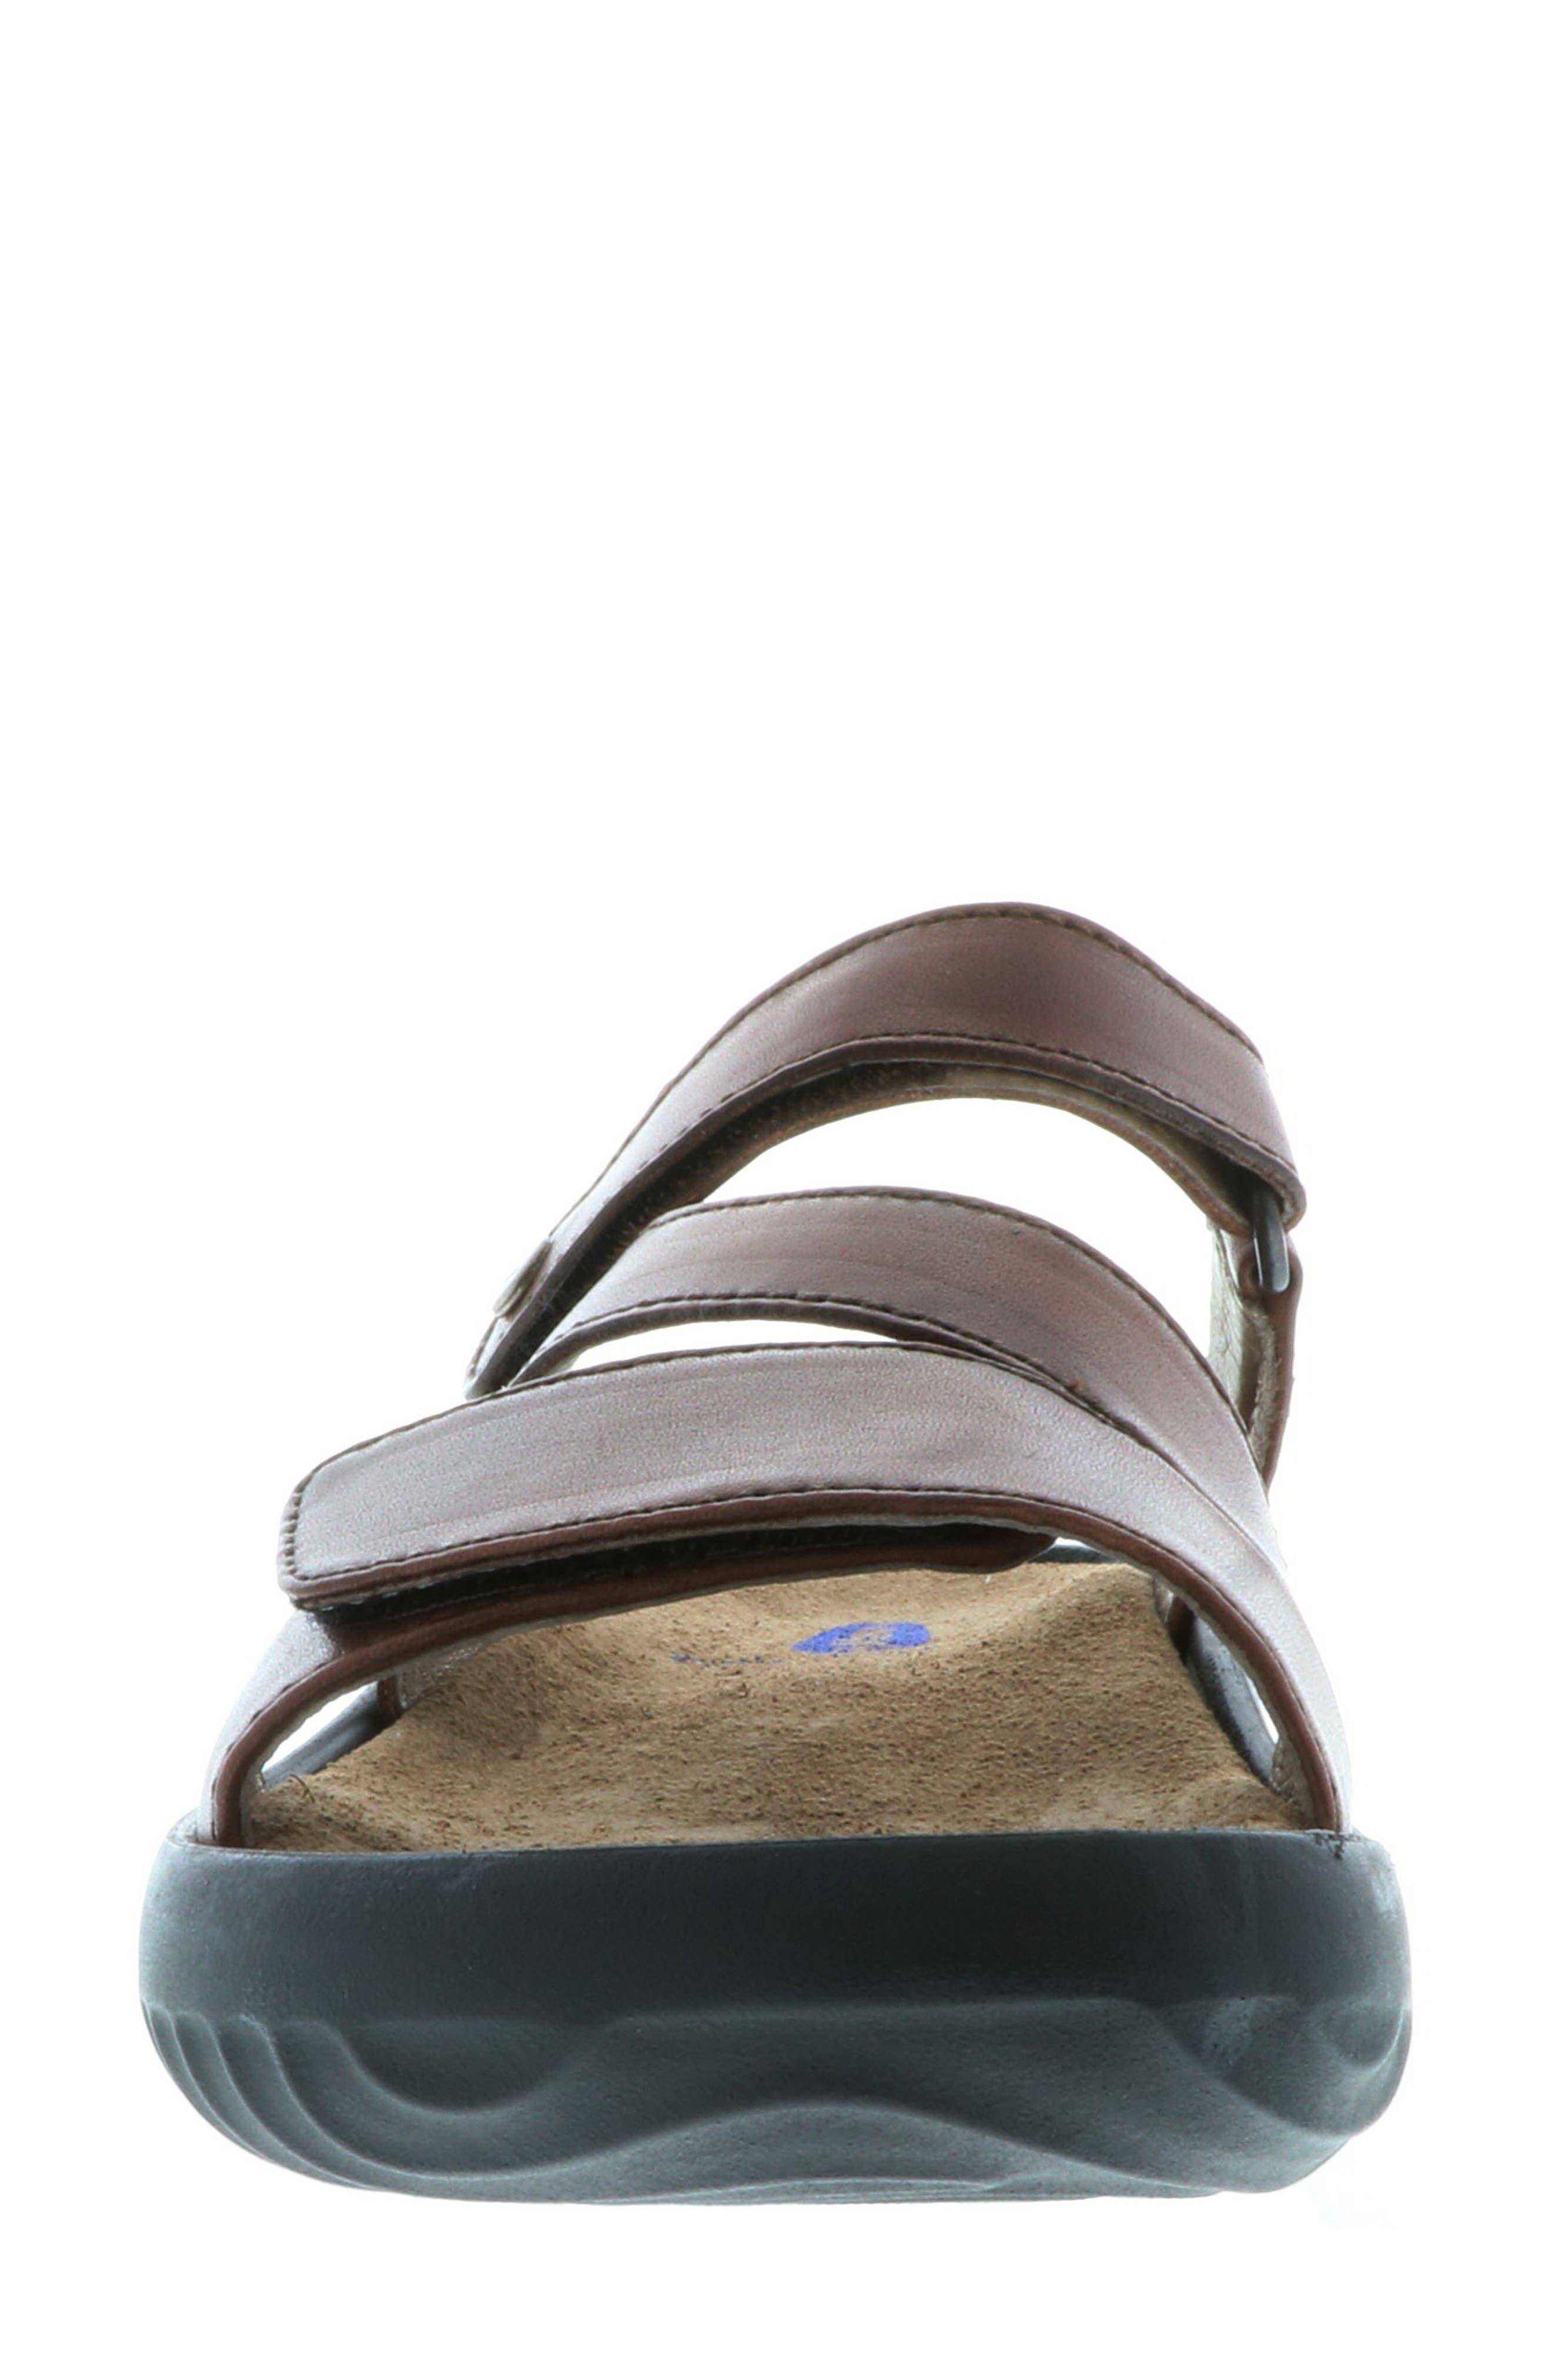 Sense Slide Sandal,                             Alternate thumbnail 4, color,                             Cognac